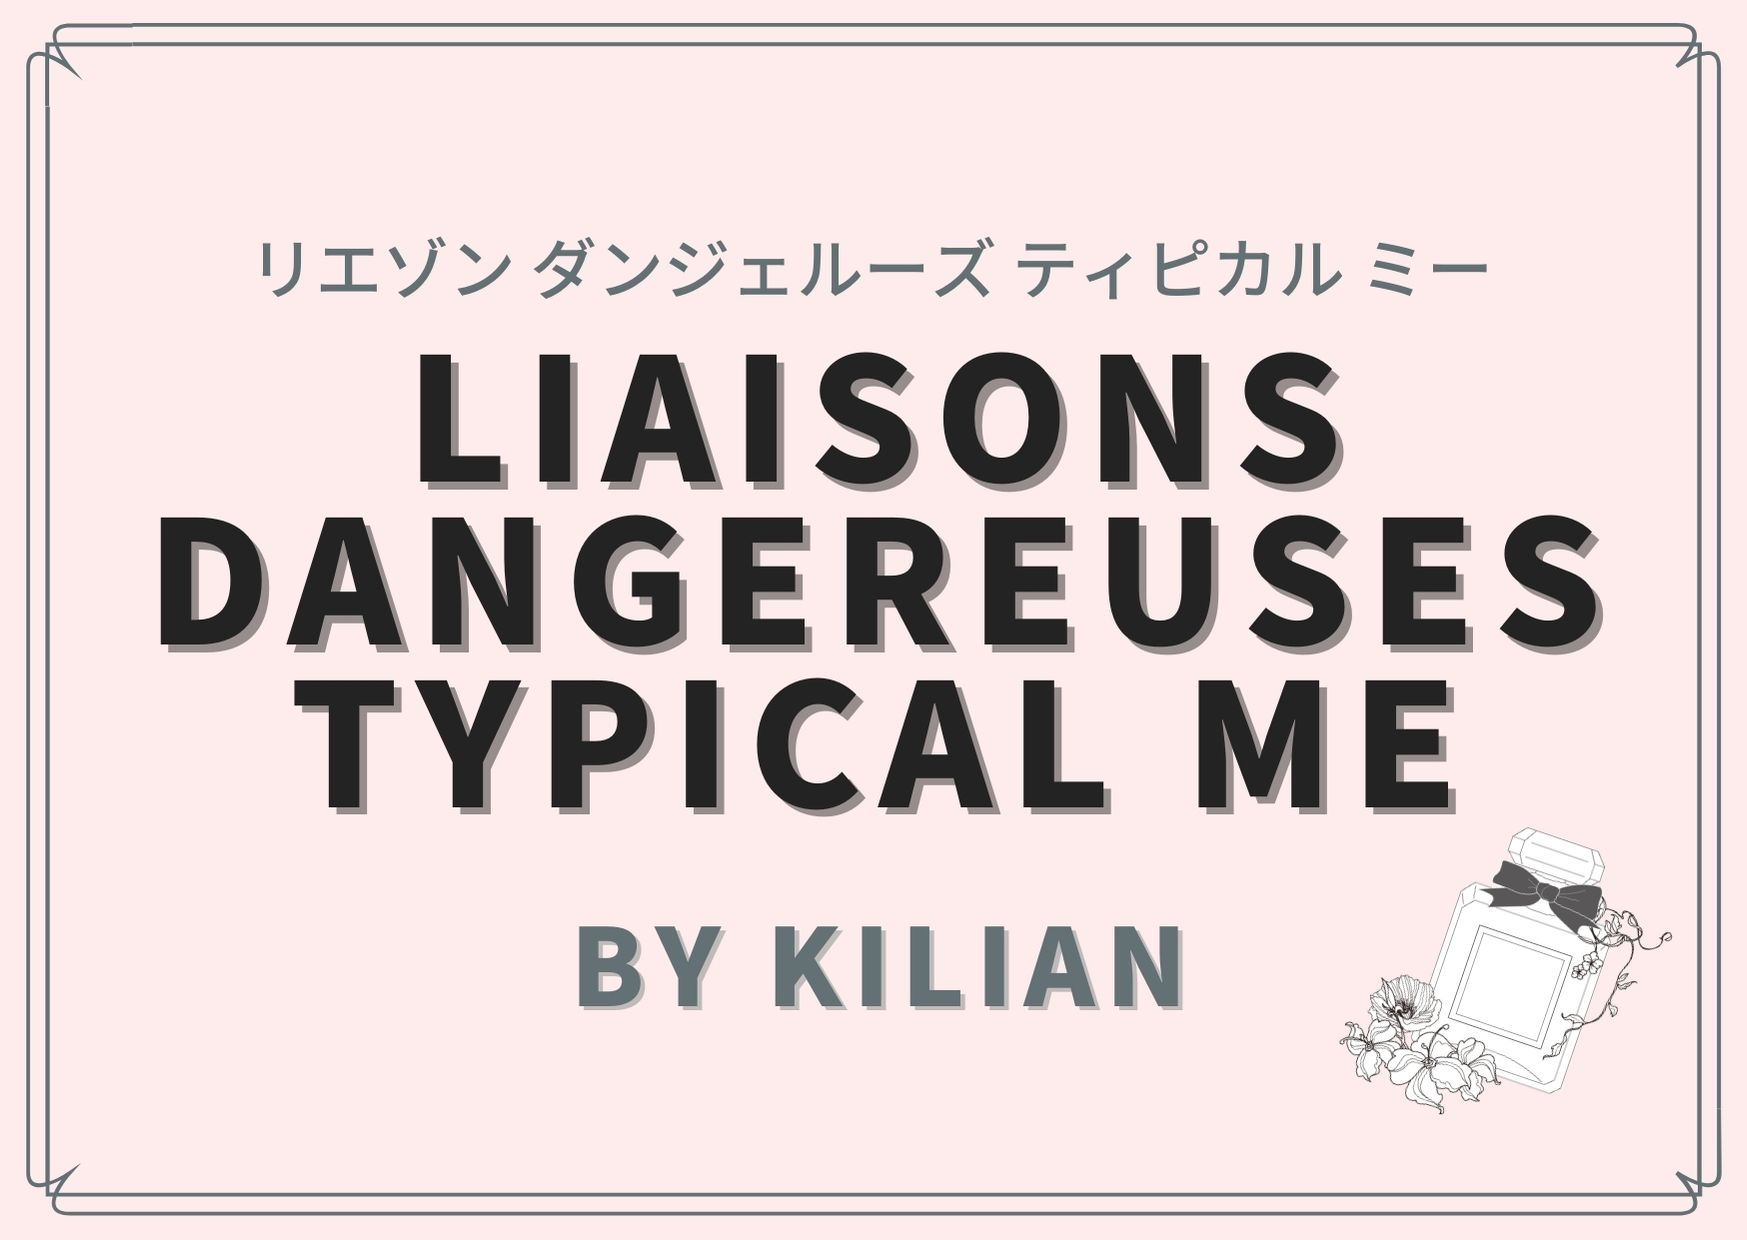 Liaisons Dangereuses typical me (リエゾン ダンジェルーズ ティピカル ミー )/ By Kilian(バイ キリアン)